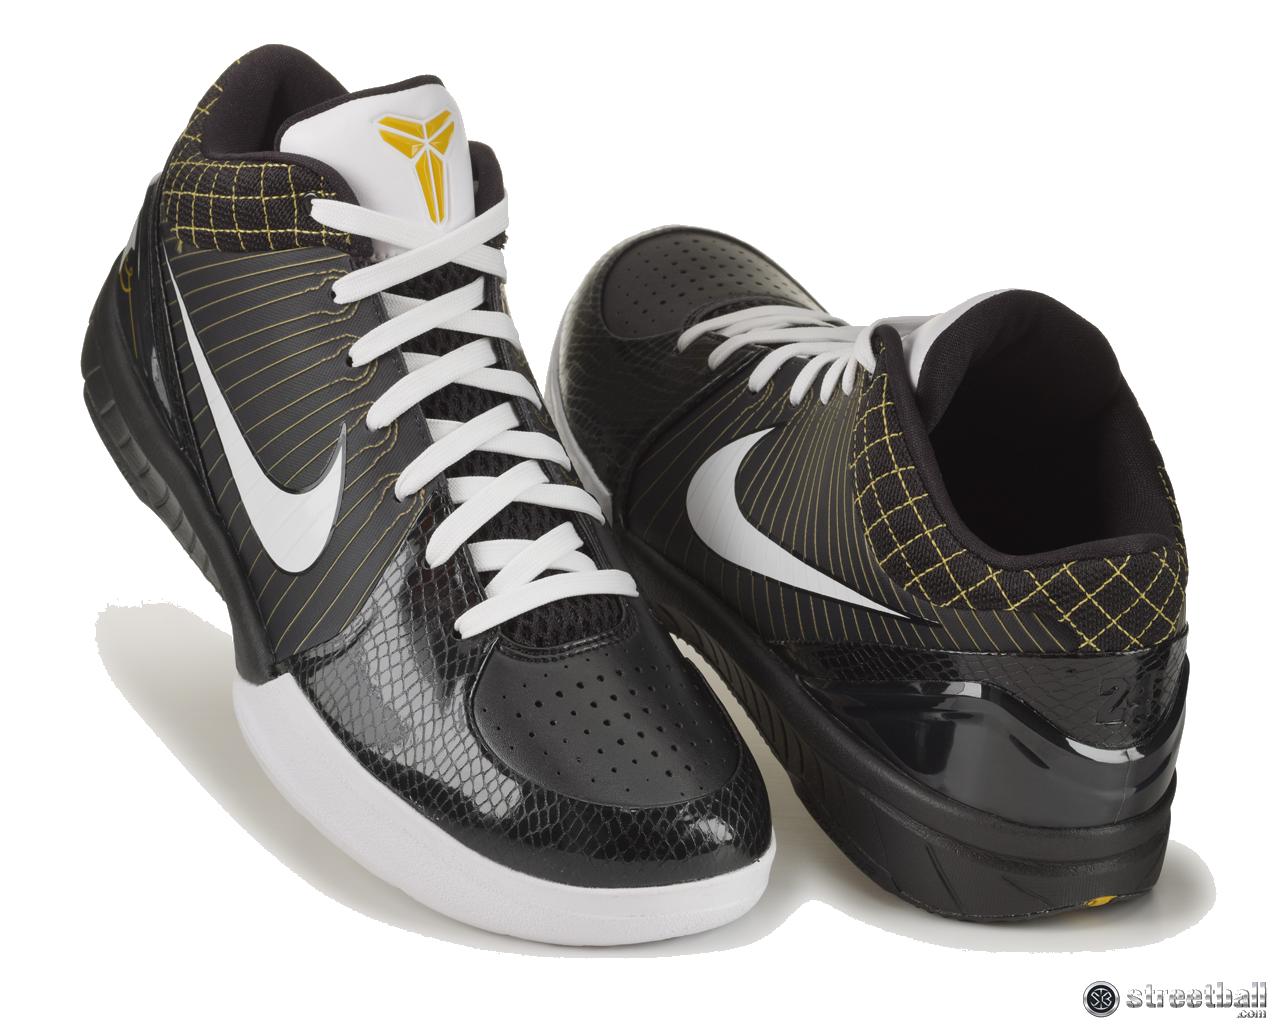 Nike Shoes: For Athletes and Everyday - Fashionkidunia.com